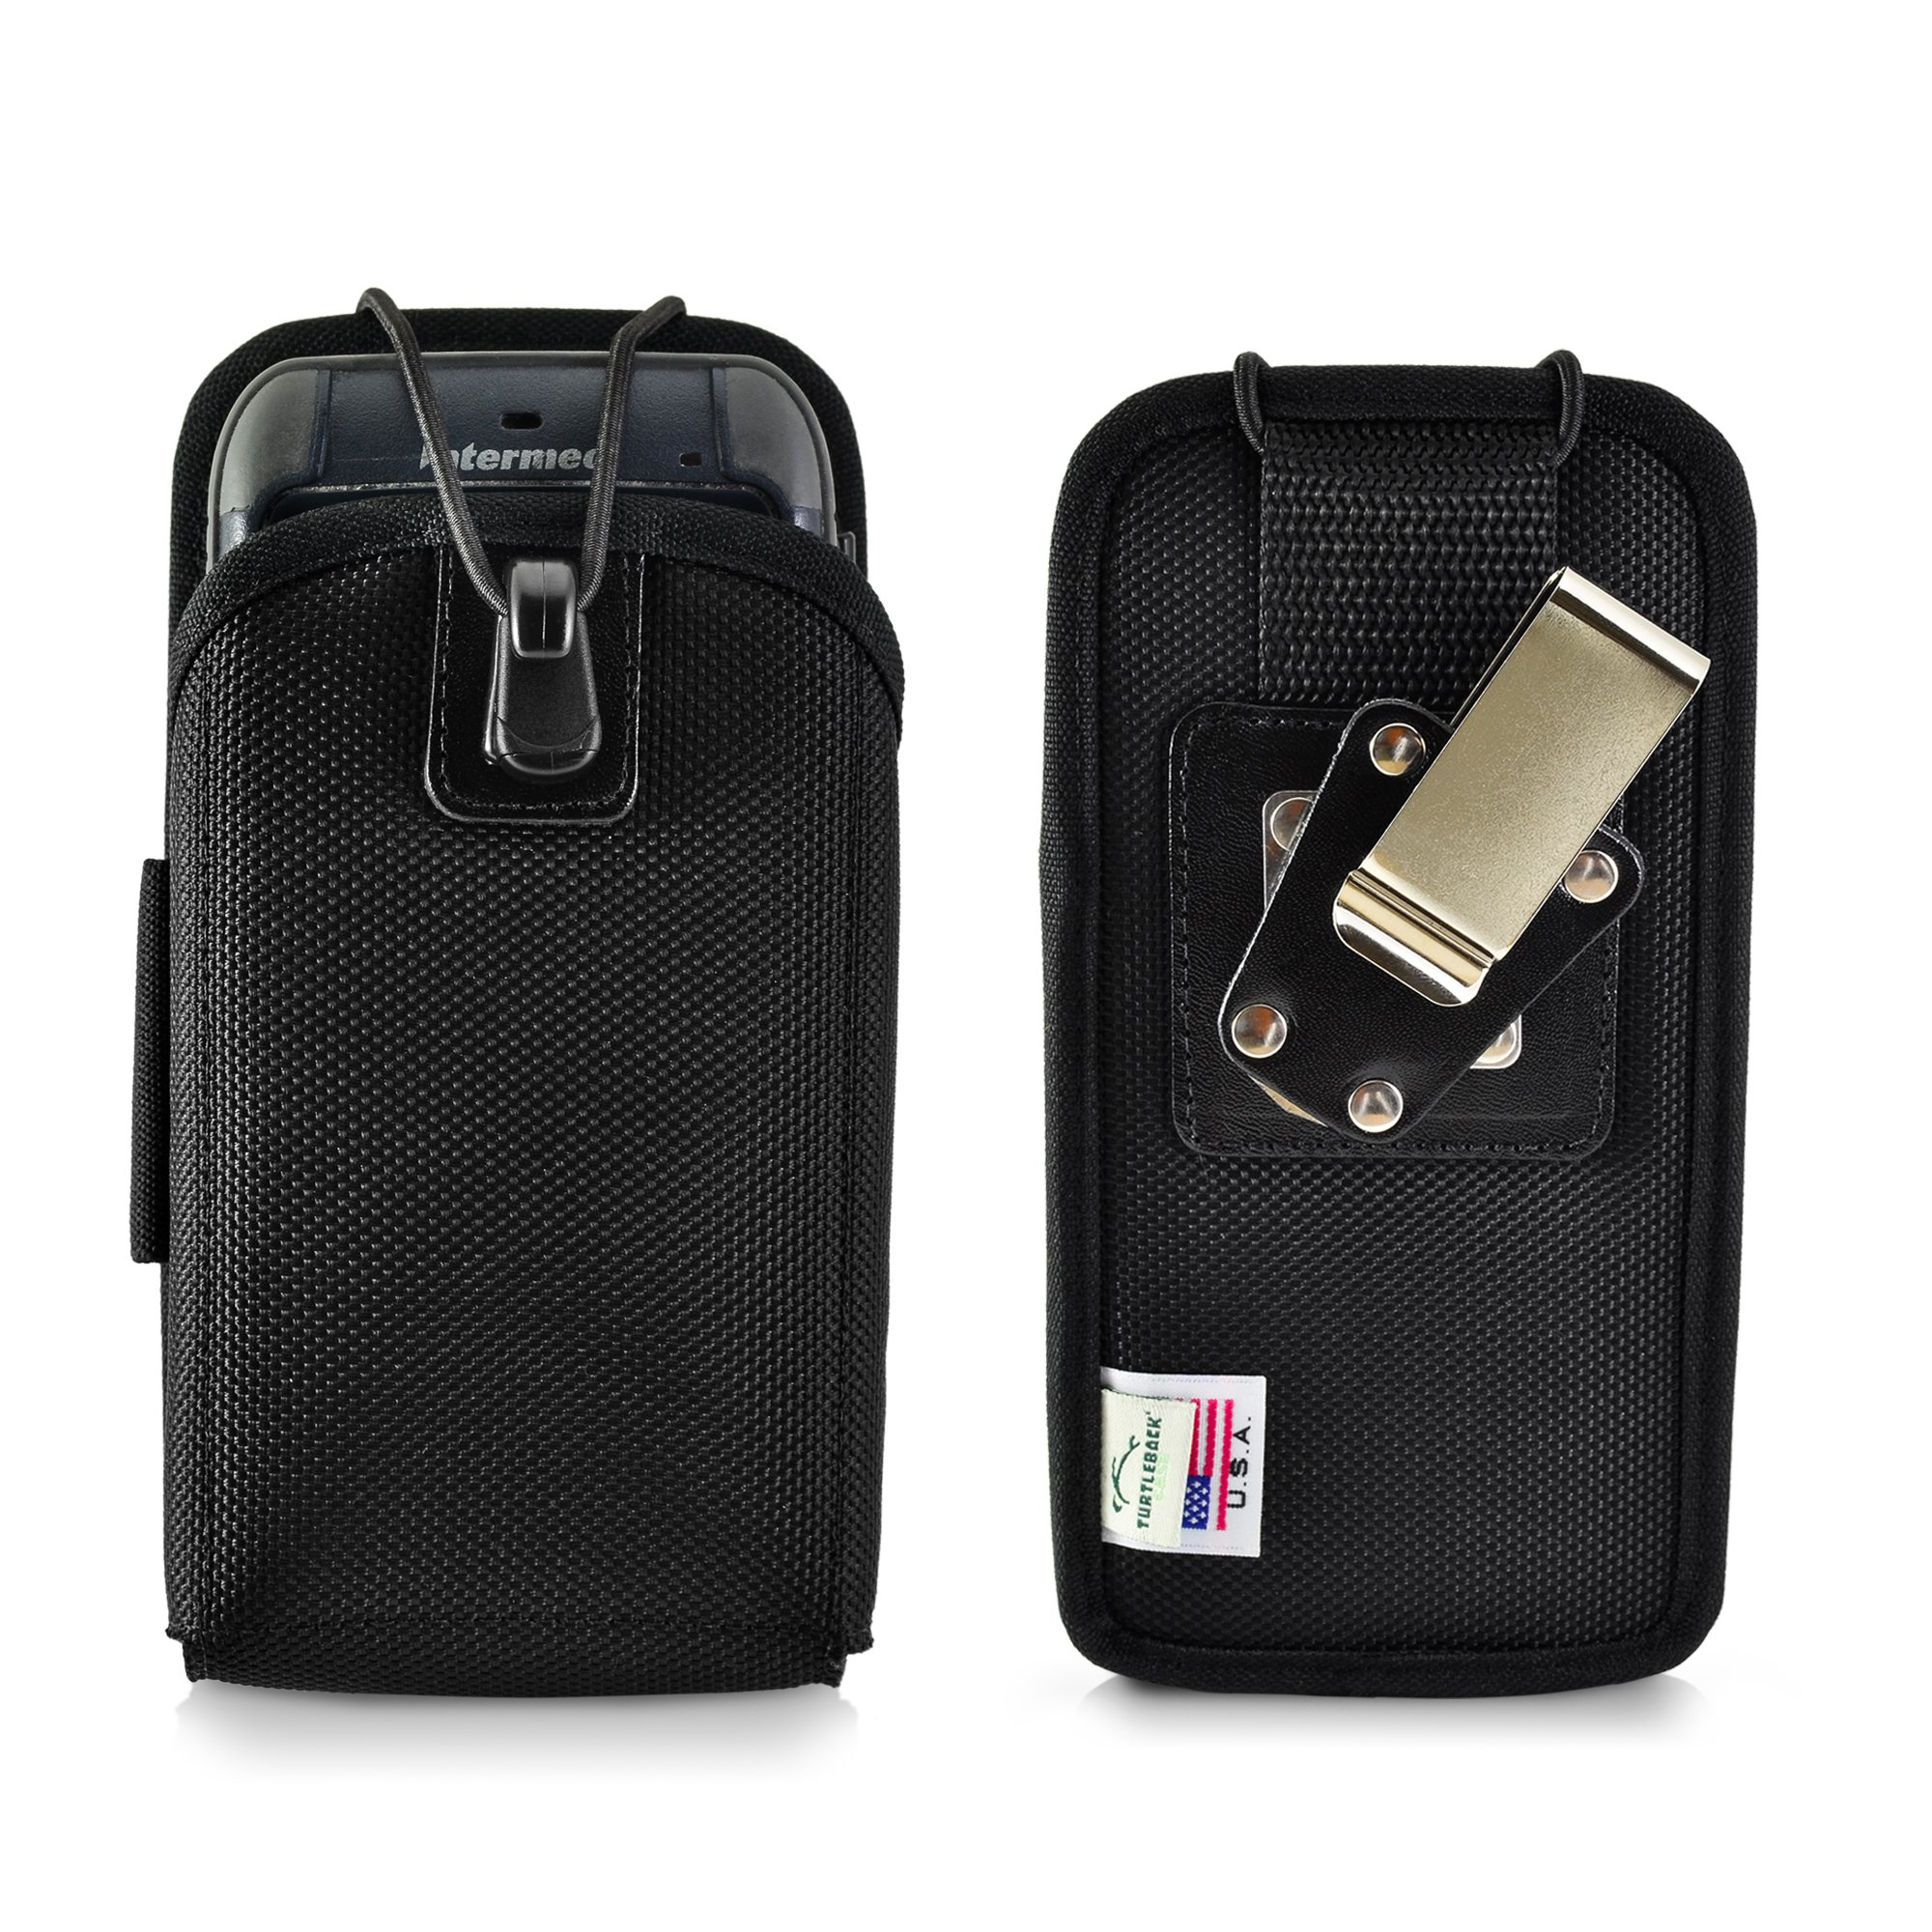 Turtleback Mobile Computer Case made for Intermec CN70 Touch Computer Nylon Holster, 2 Belt Clips (Metal Clip & Belt Loop) Mobile Scanner Holder Fits devices 6 3/4''X 3 1/4''X 1 1/2''